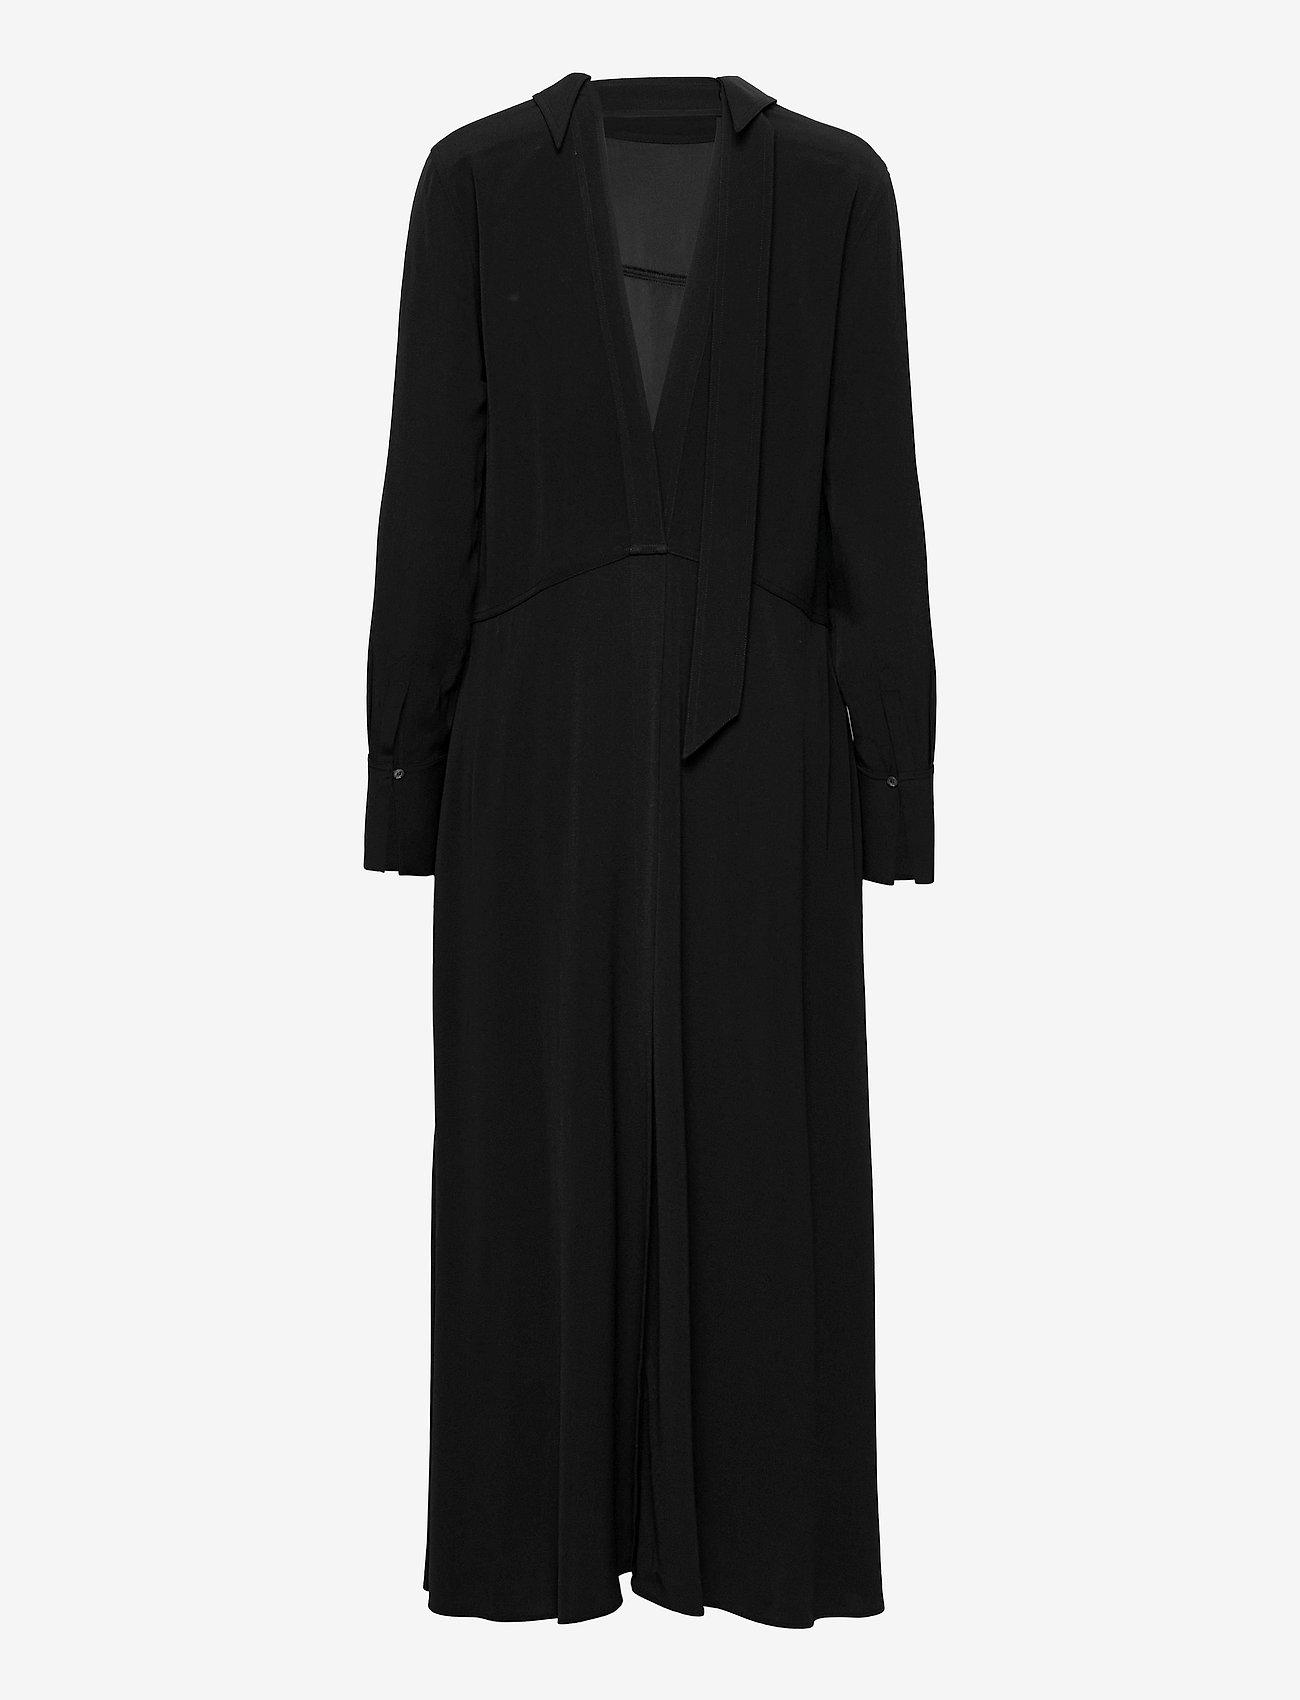 Victoria Victoria Beckham - LONG SLEEVE MAXI DRESS - evening dresses - black - 1